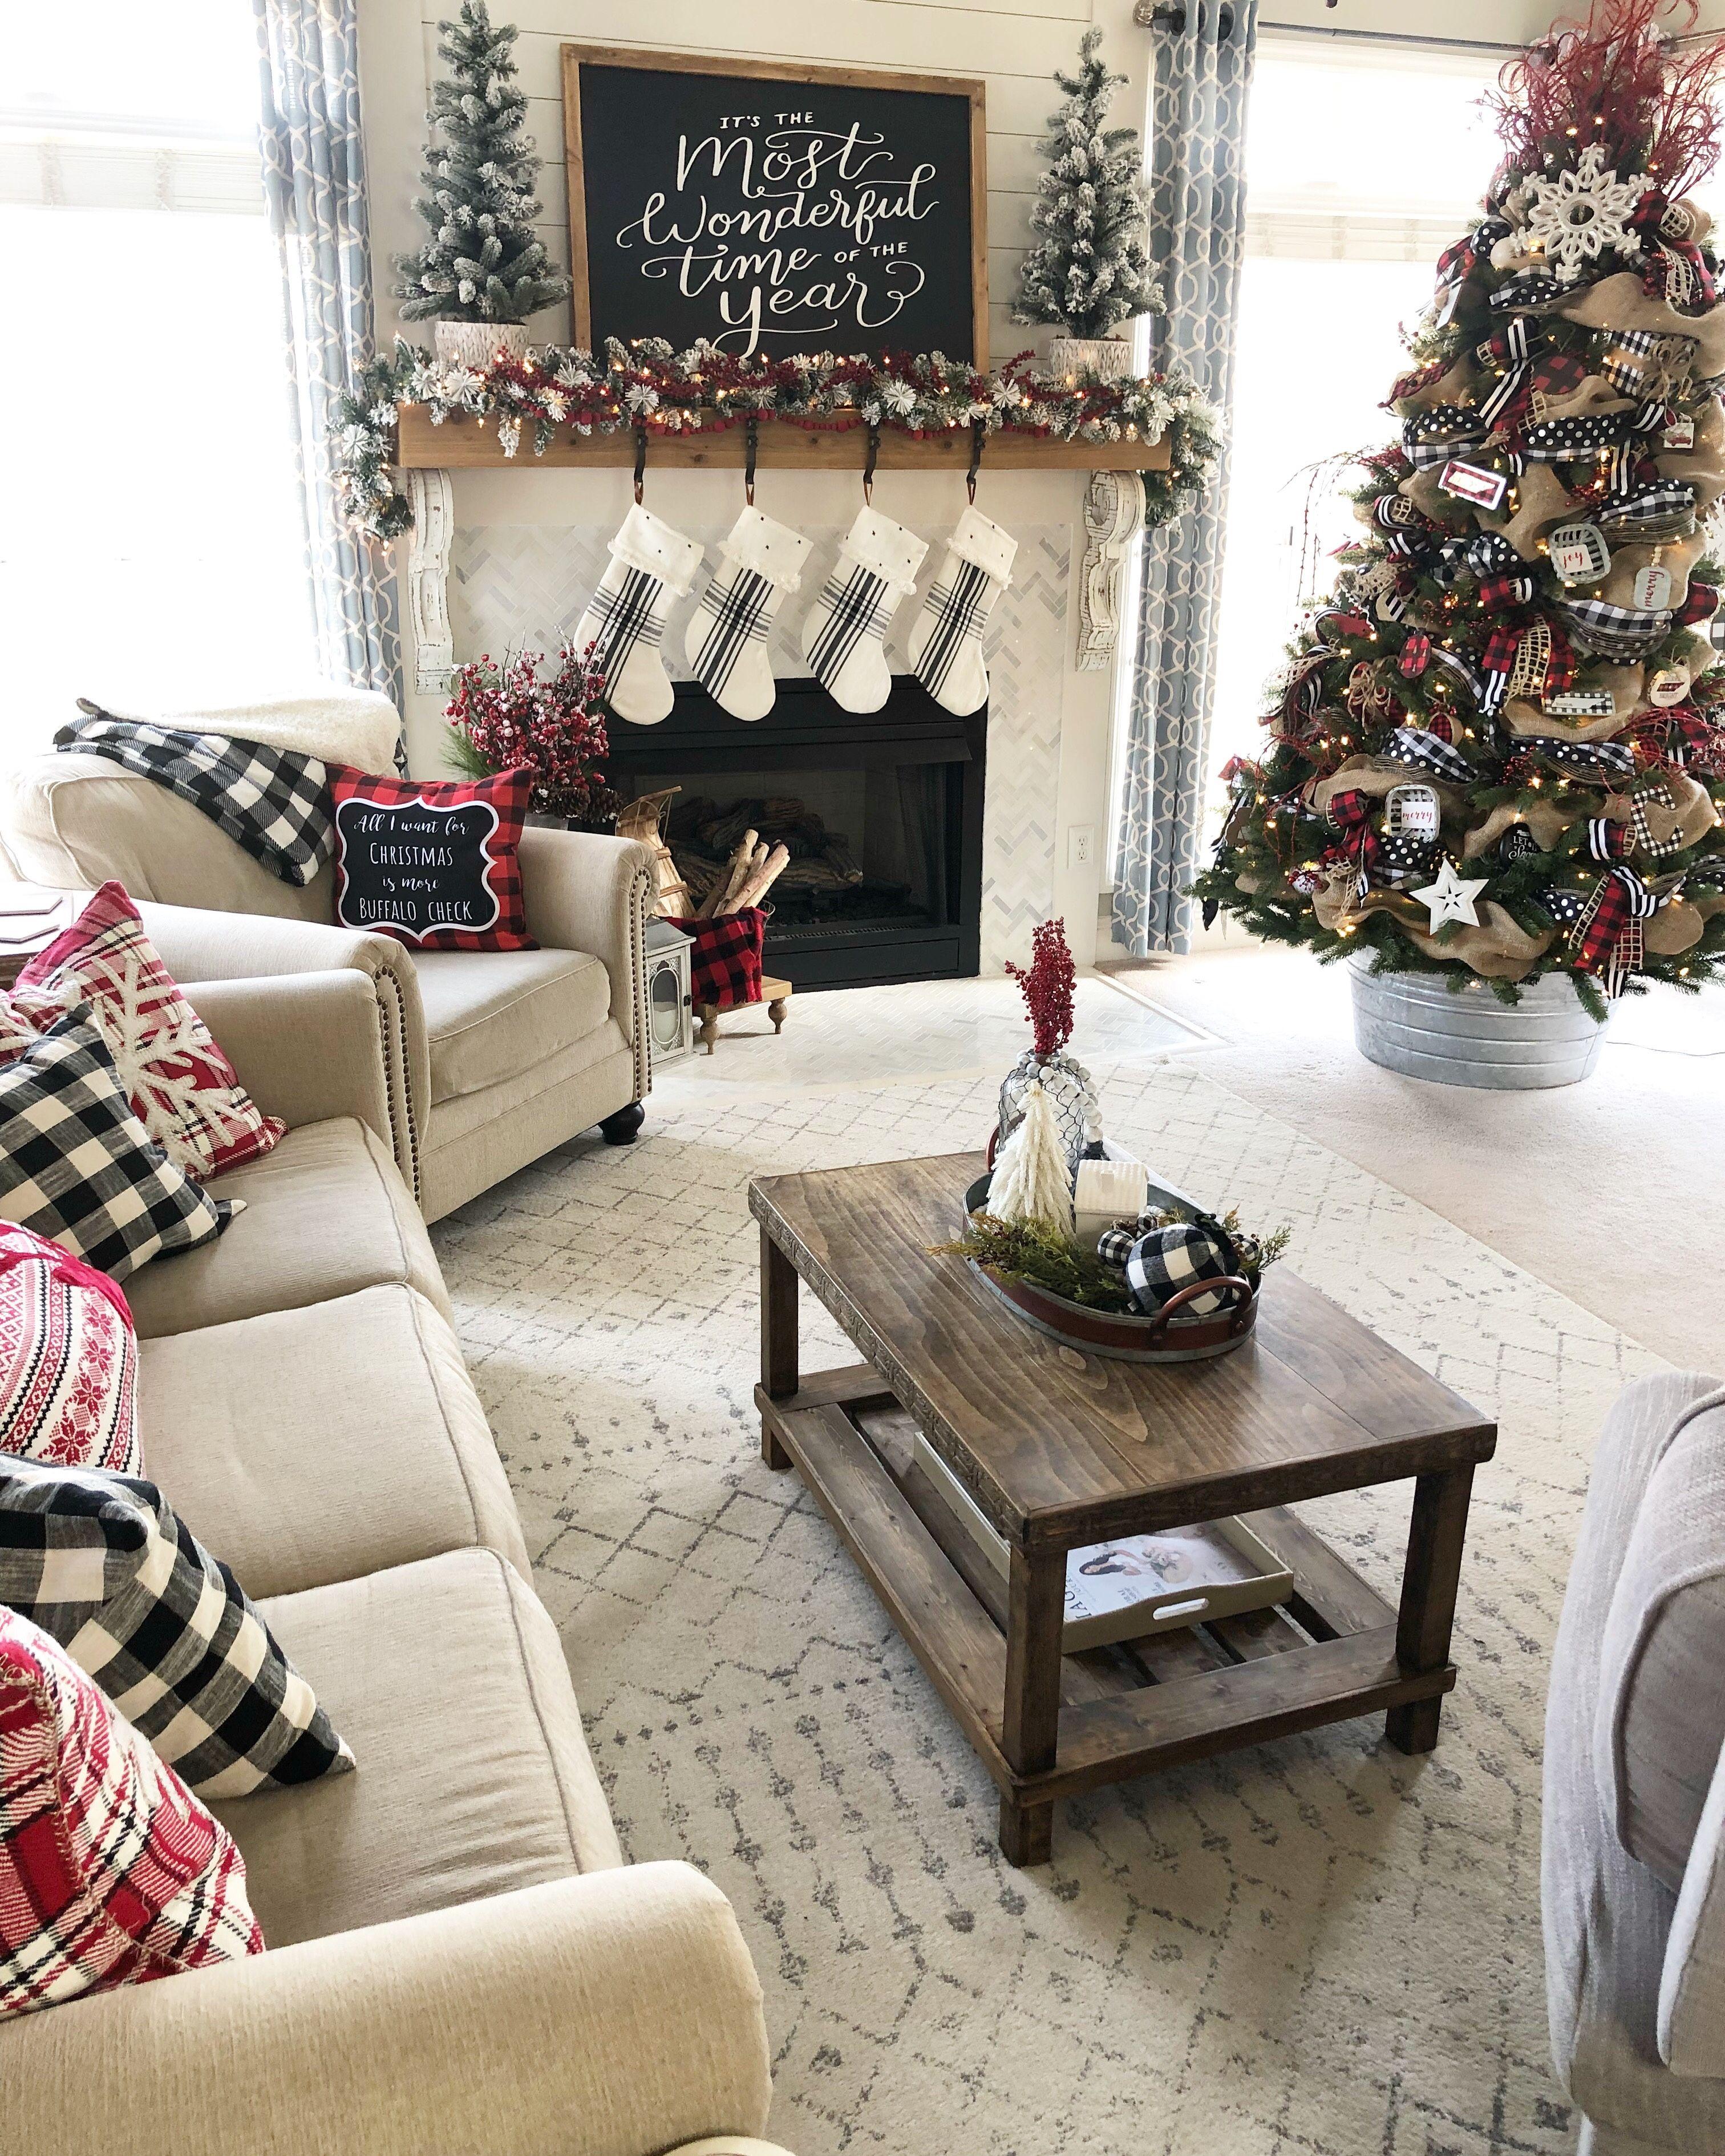 Christmas Home Tour Buffalo Check And Plaid Living Room With Tree With R Christmas Decorations Living Room Christmas Fireplace Decor Cozy Christmas Living Room